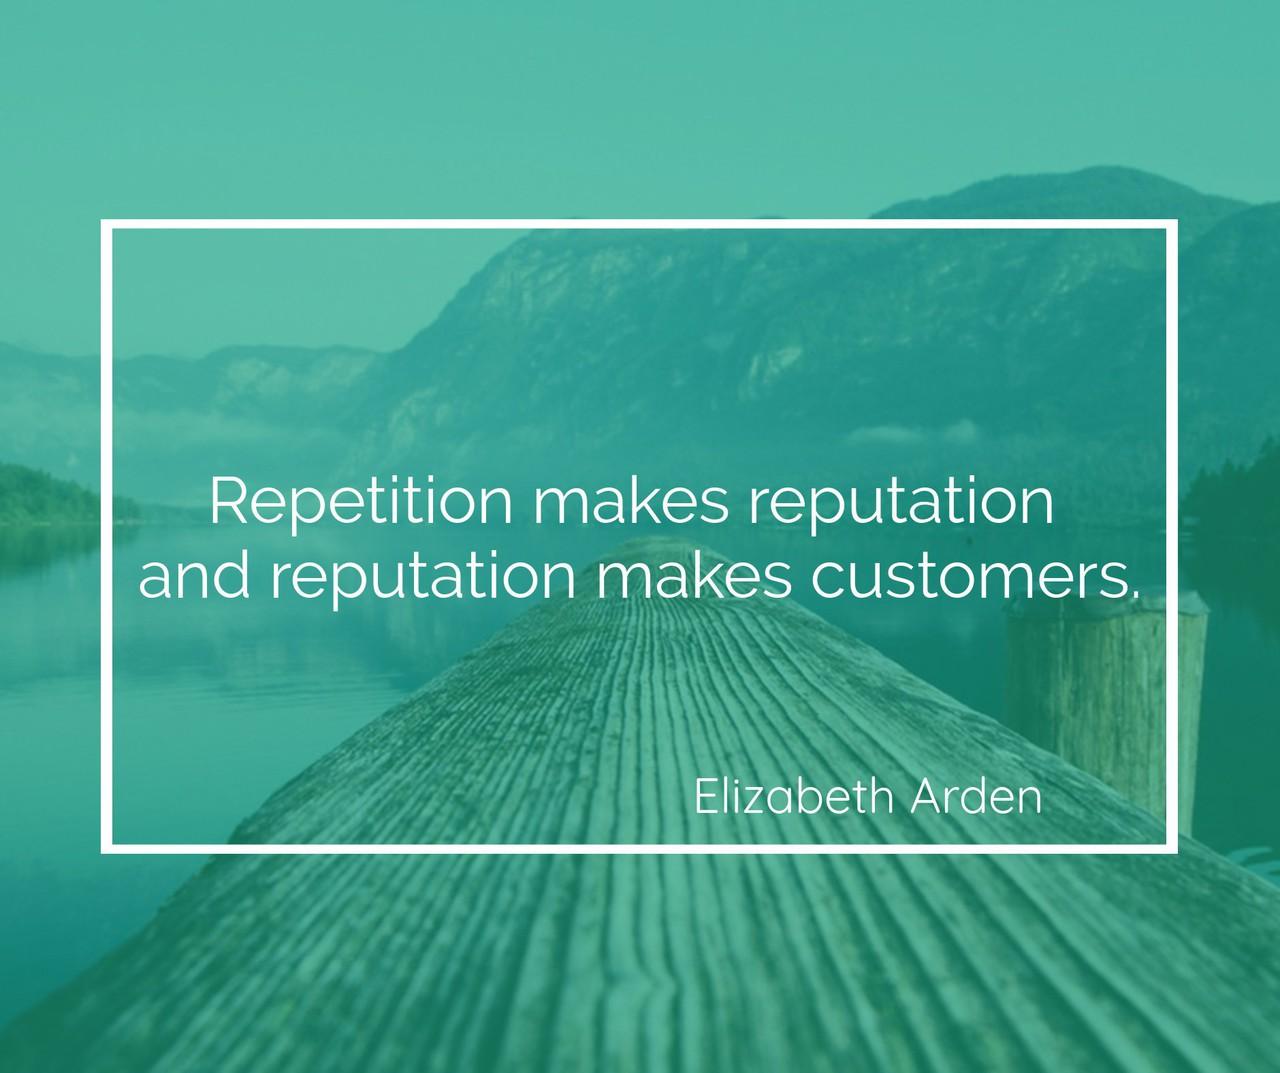 Repetition makes reputation.jpg